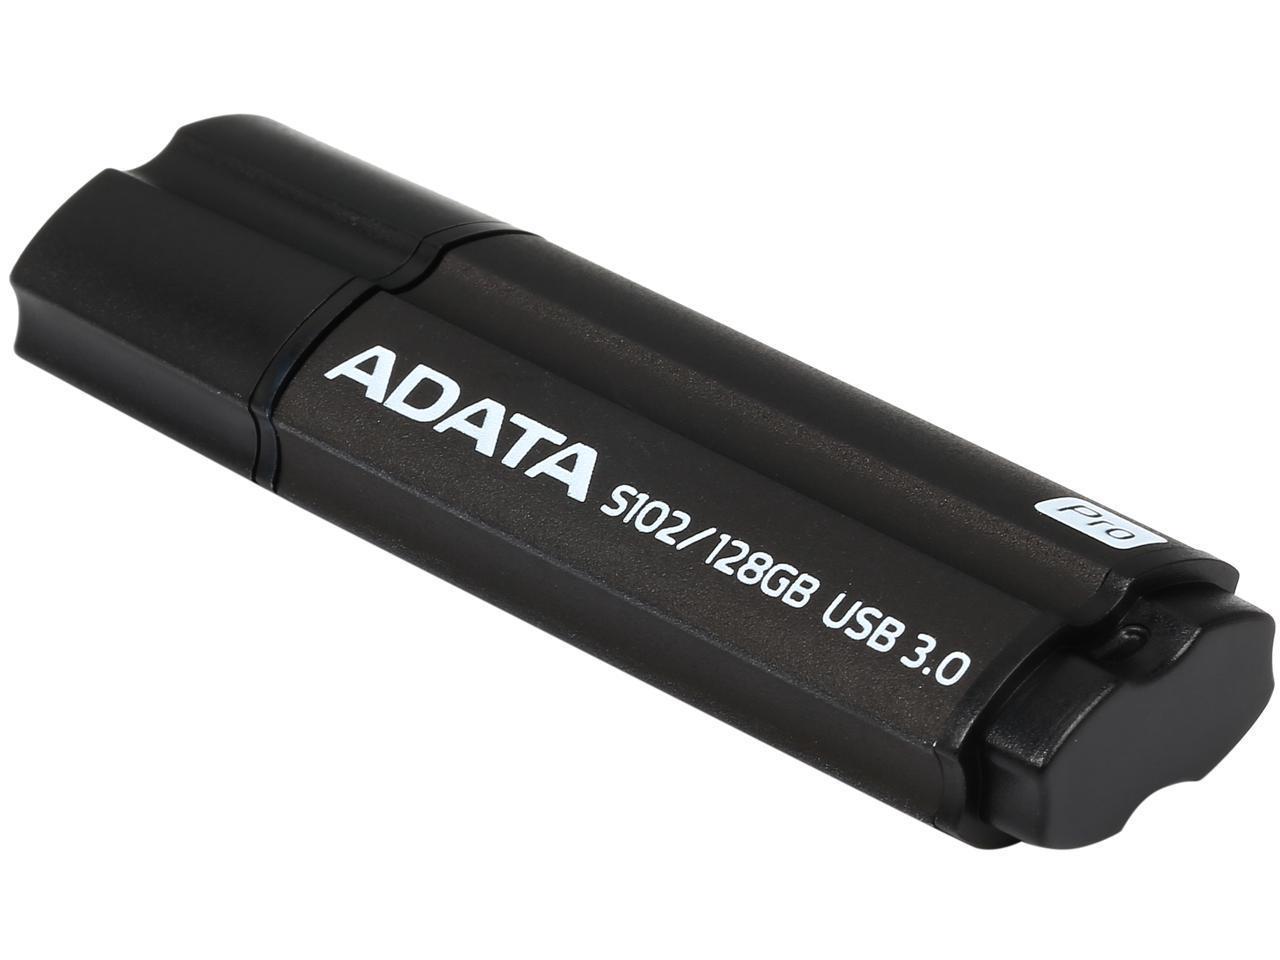 Флешка ADATA DashDrive Elite S102PRO, 128GB, UFD 3.0, Gray